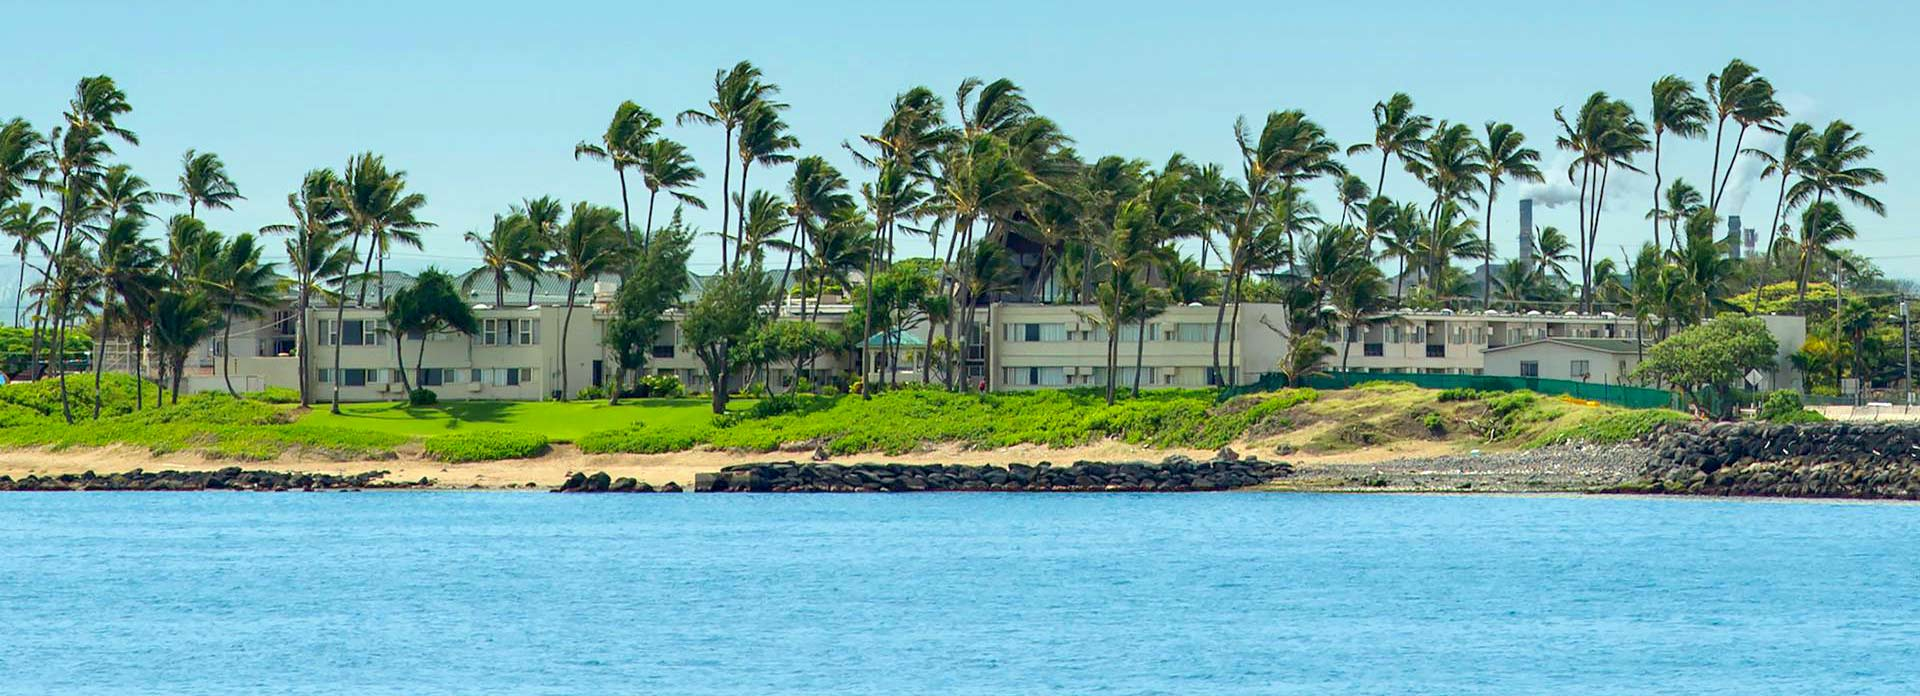 Maui Beach Hotel S 1920x600 Jpg